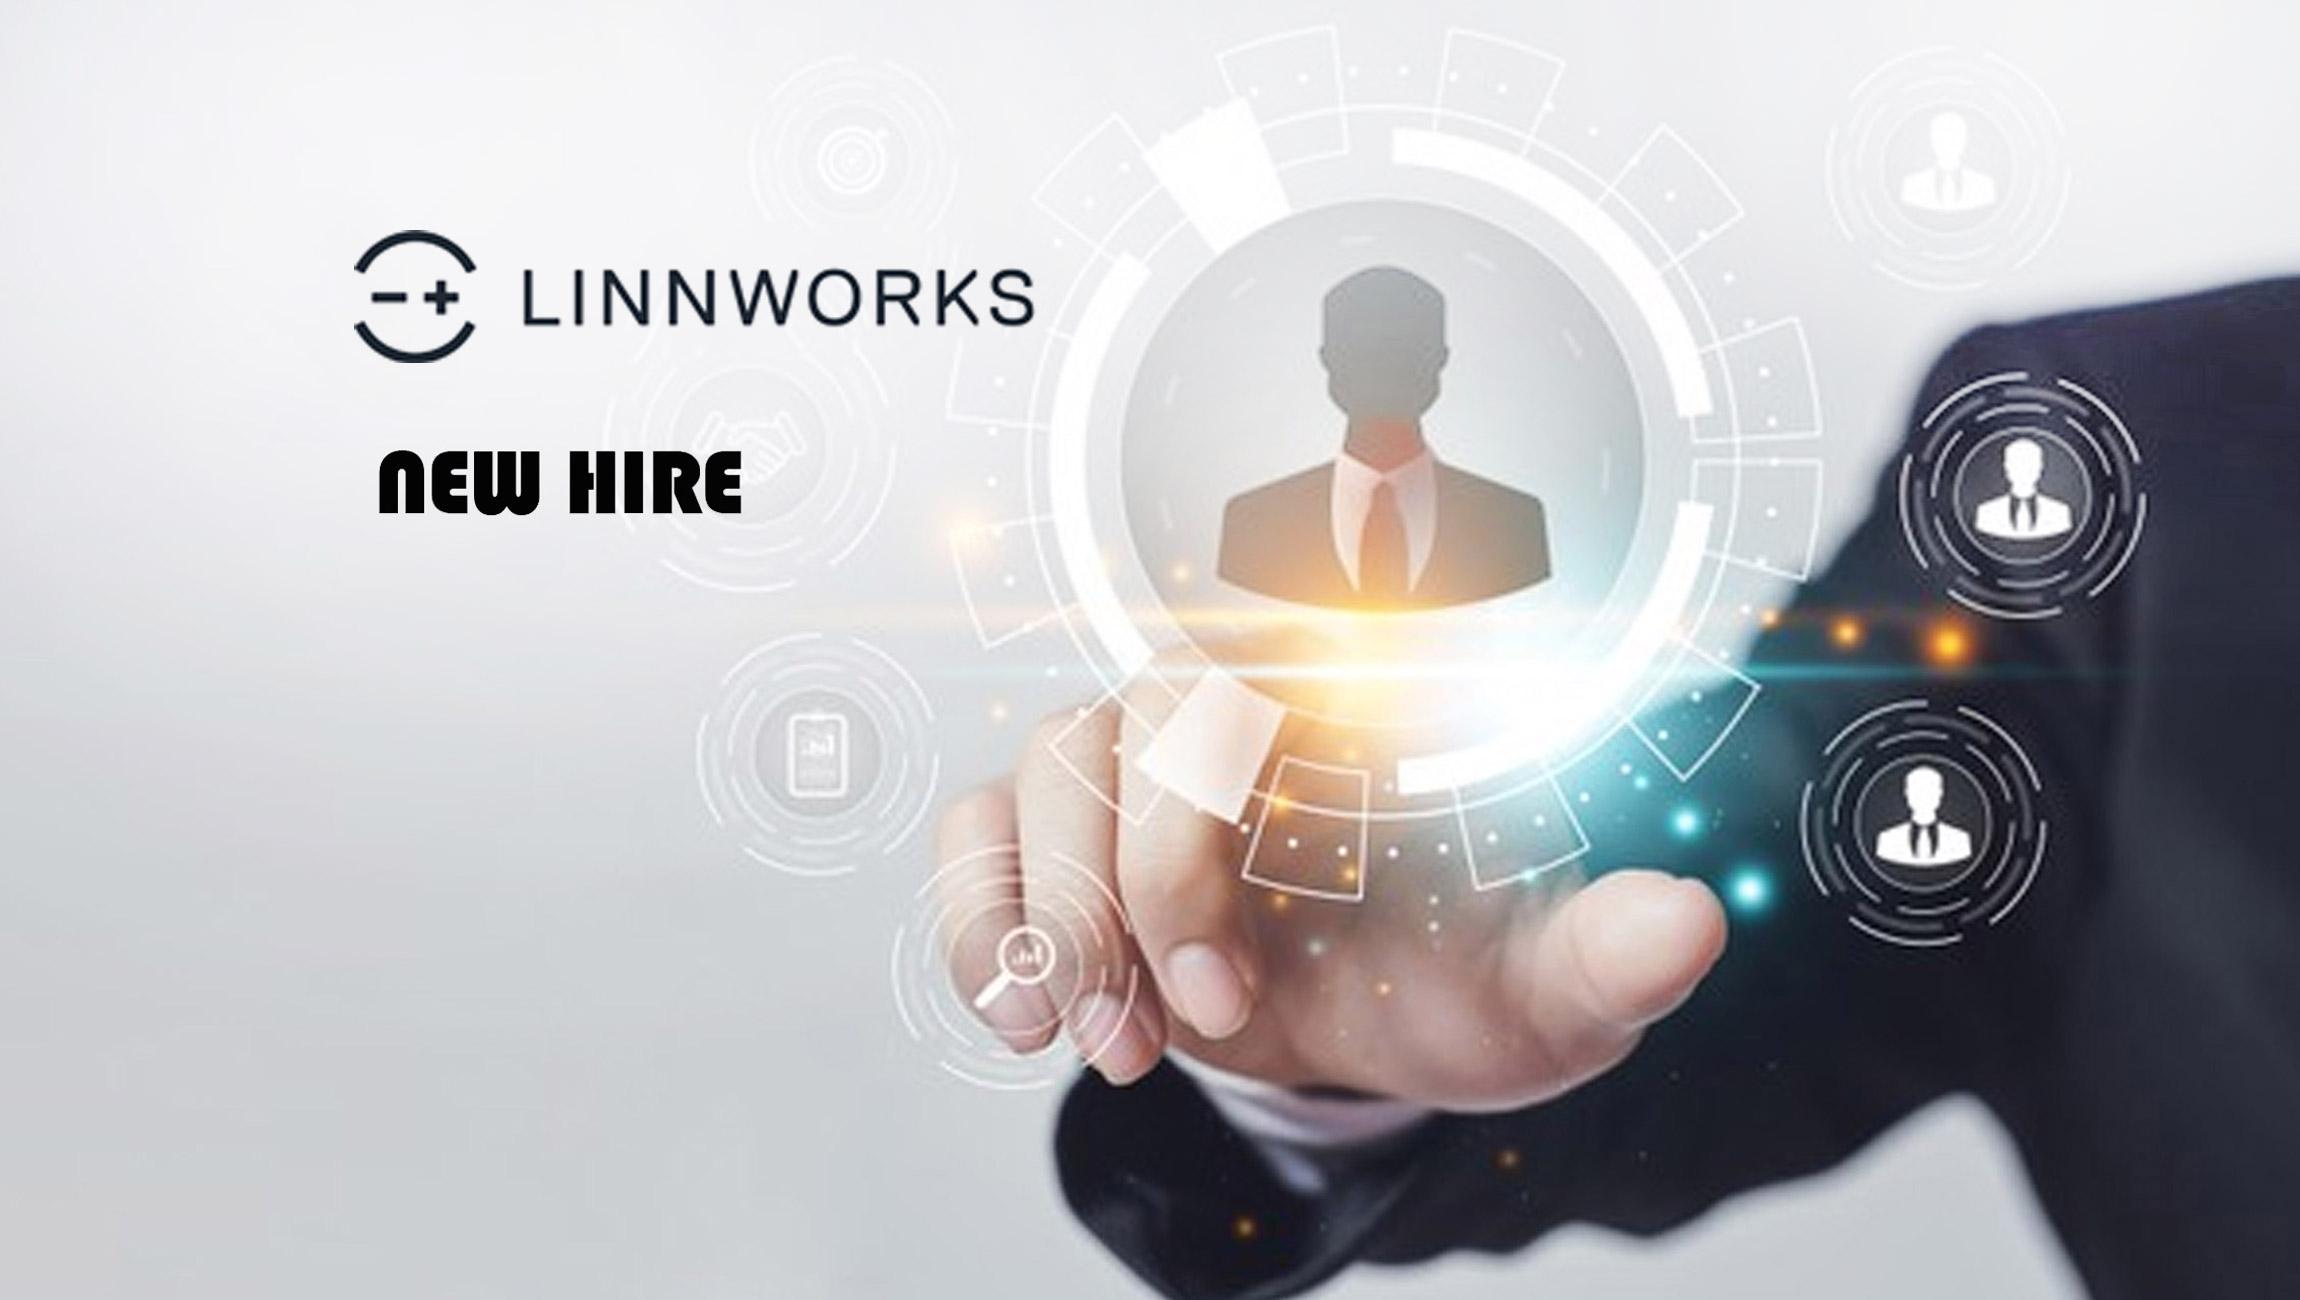 Linnworks Announces Simon Curd as Vice President Product